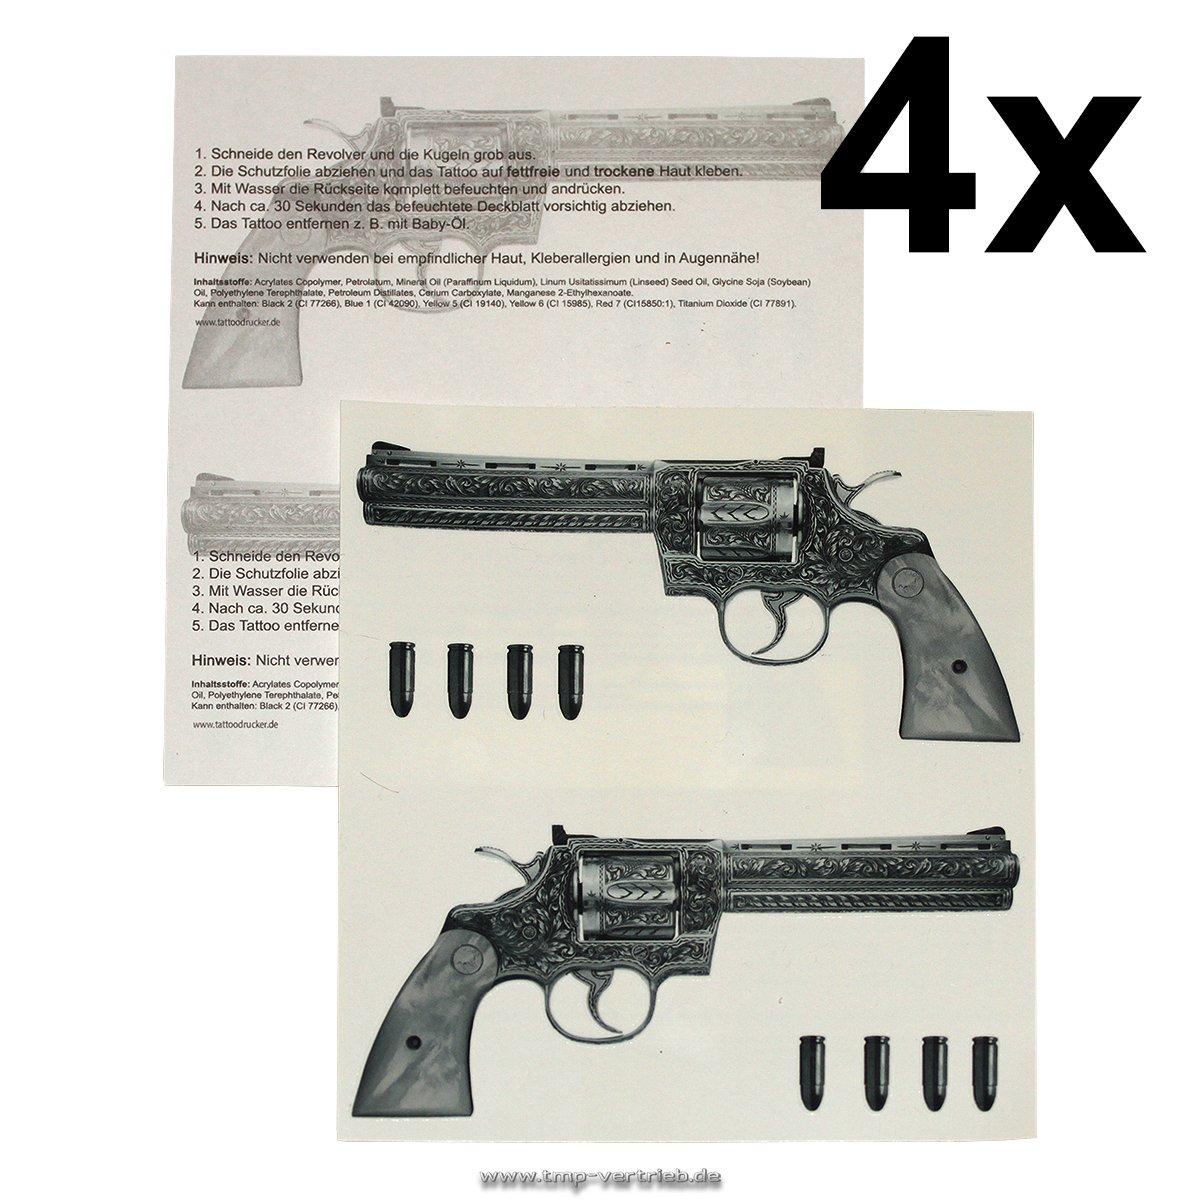 2 x Gun Tattoo - 2 Guns Tattoo - Gangster Revolver Tattoo (2) TMP Gun-2